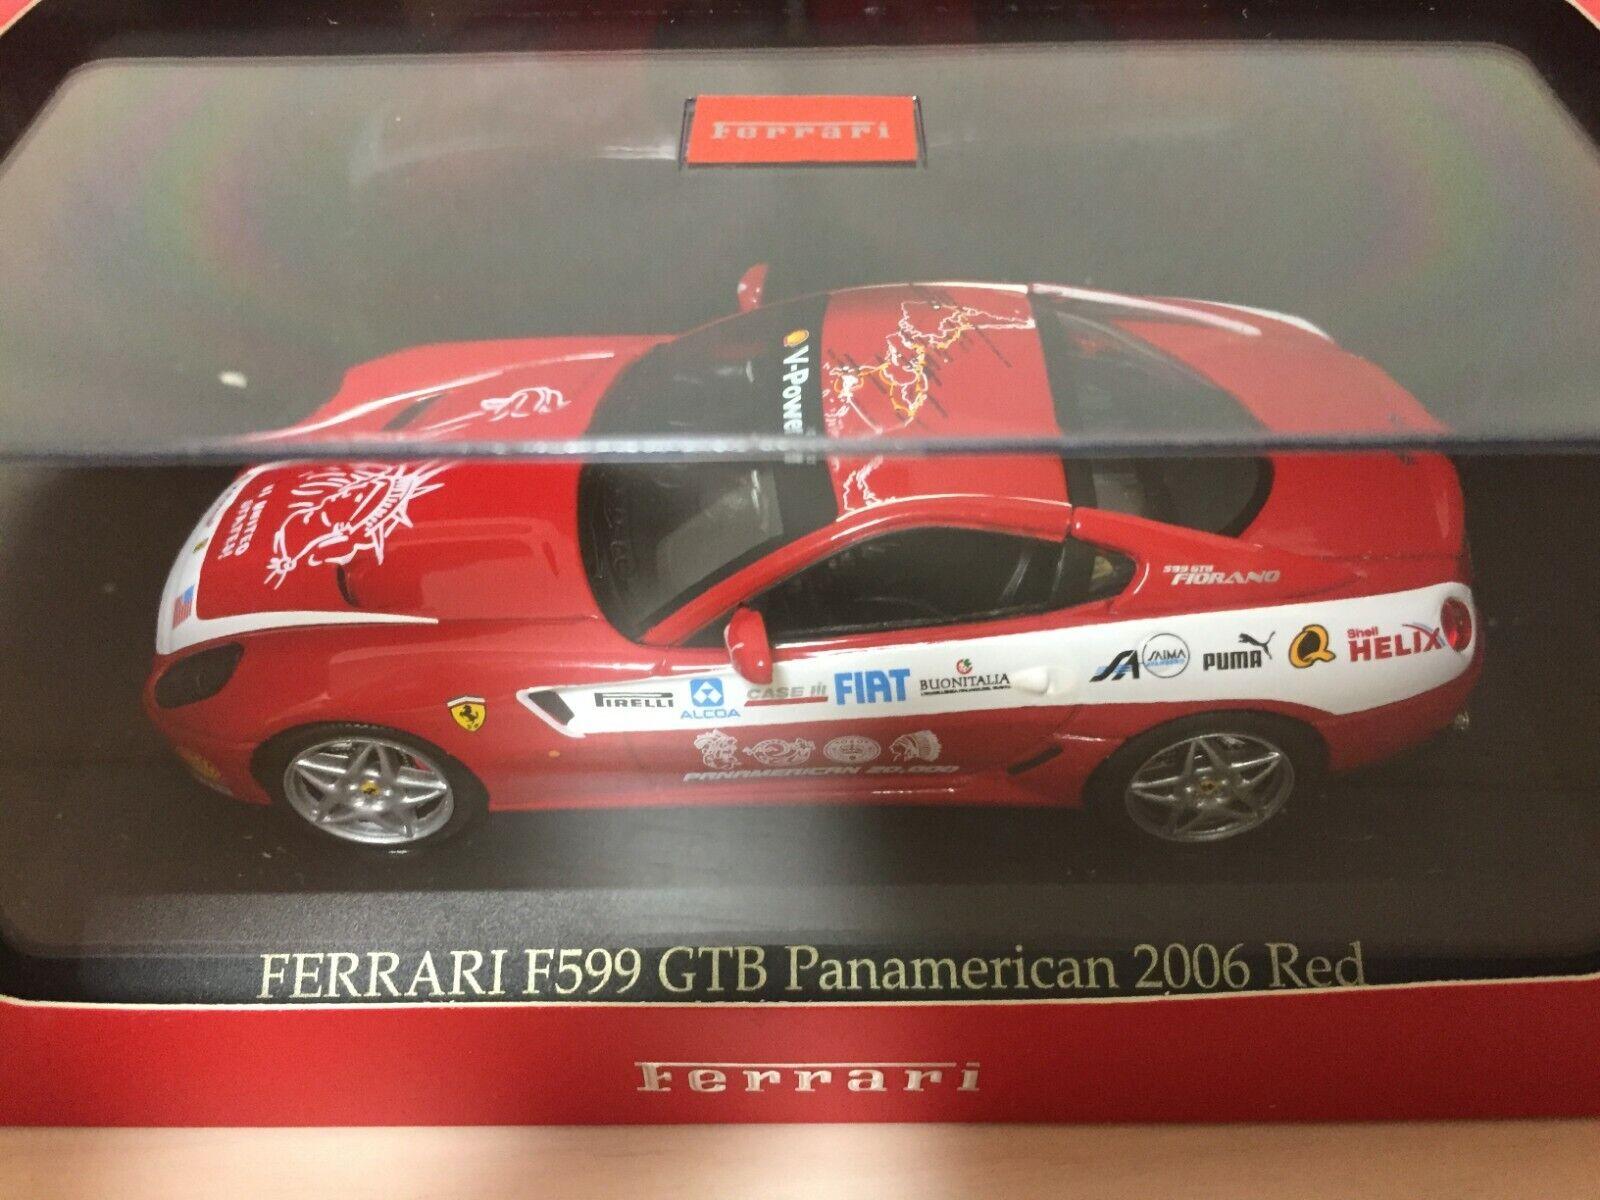 NEW IXO FERRARI F599 GTB Panamerican 2006 RED RED RED 1 43 From Japan F S 8141b5